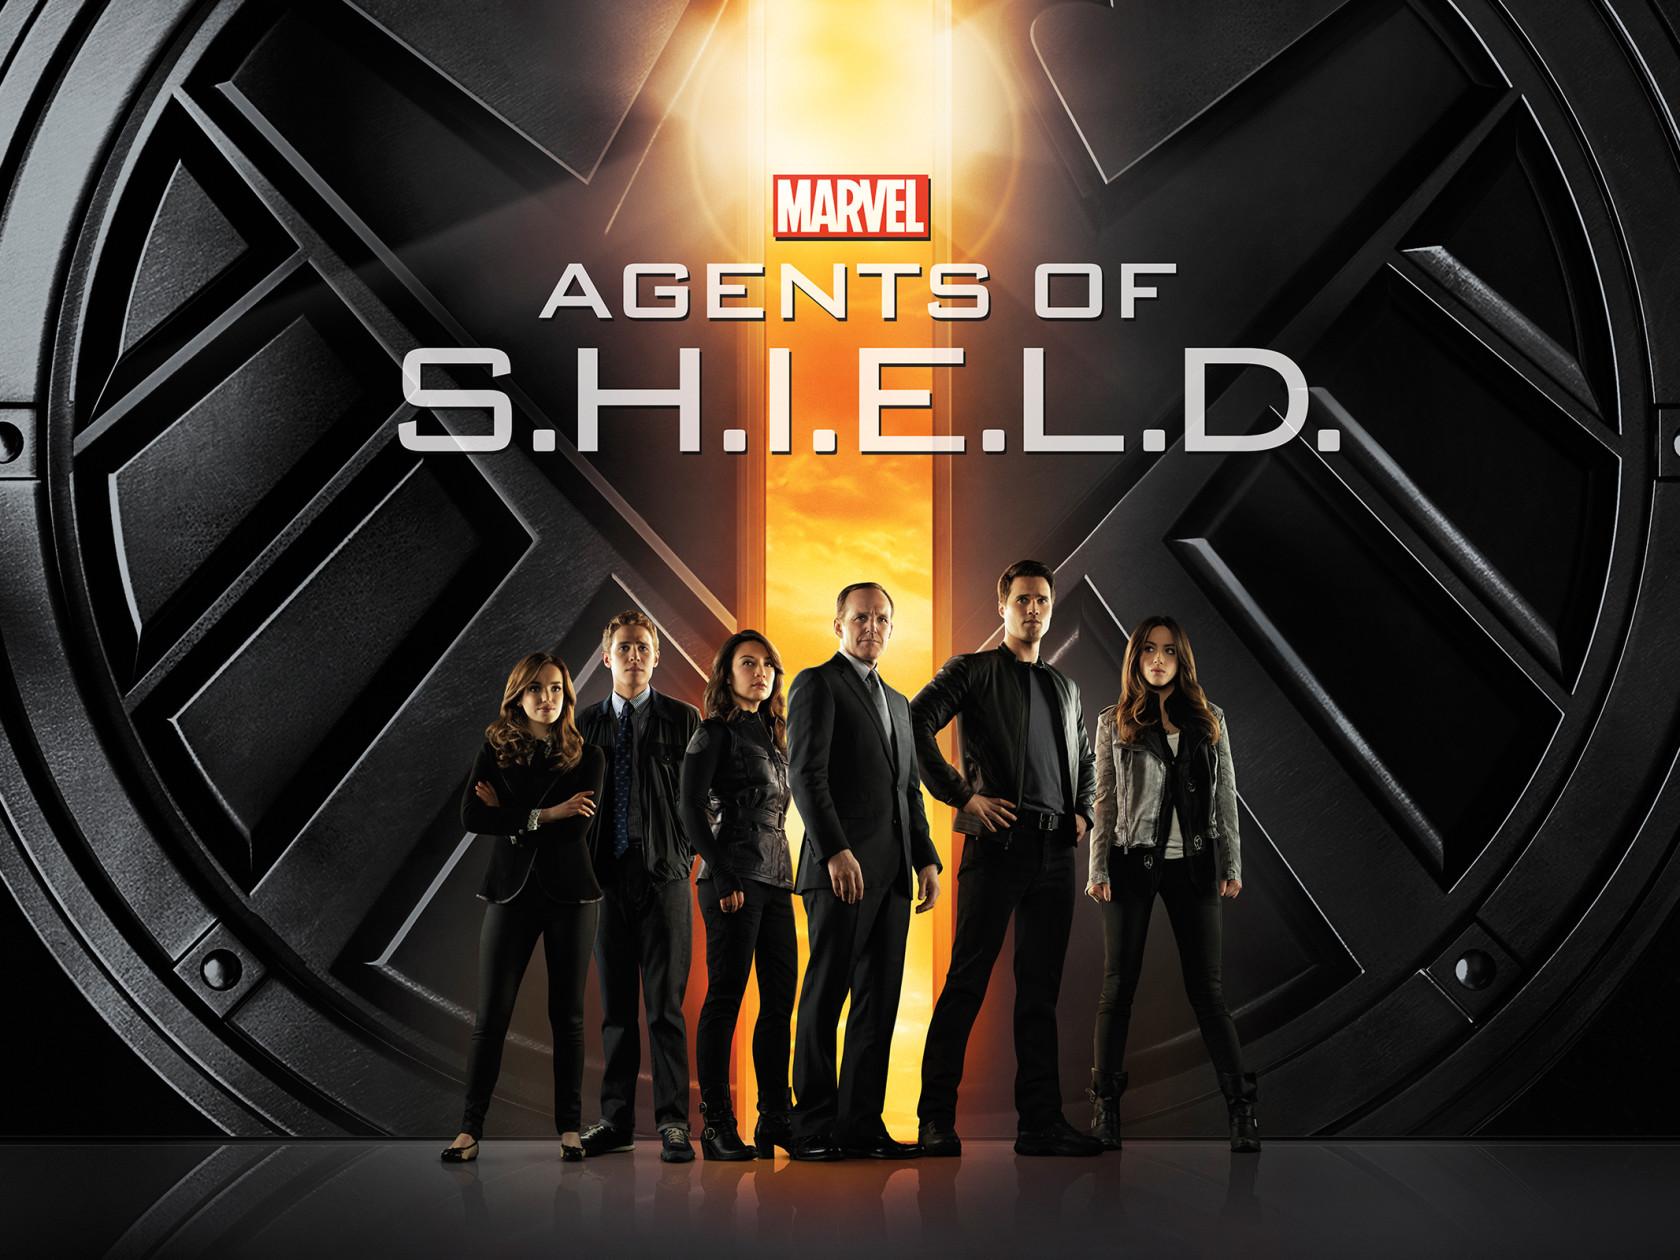 Agents of Shield HD Wallpaper 1555 1680x1260